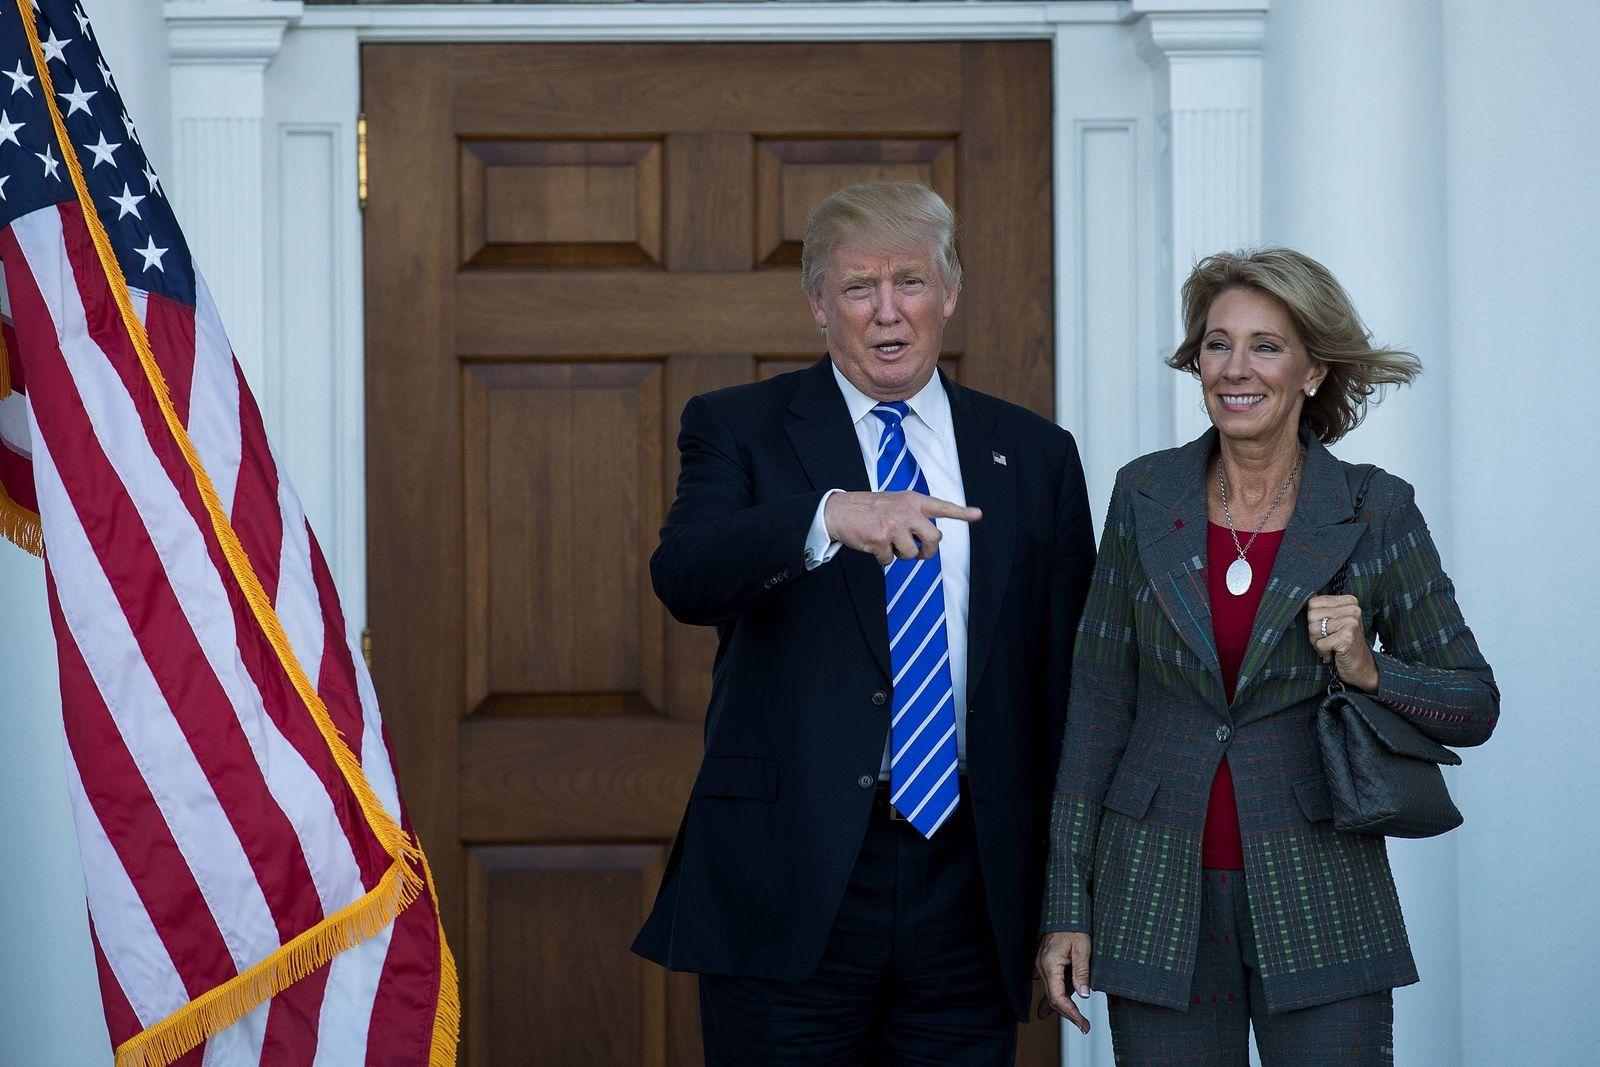 Detroit/ Betsy DeVos/ Donald Trump